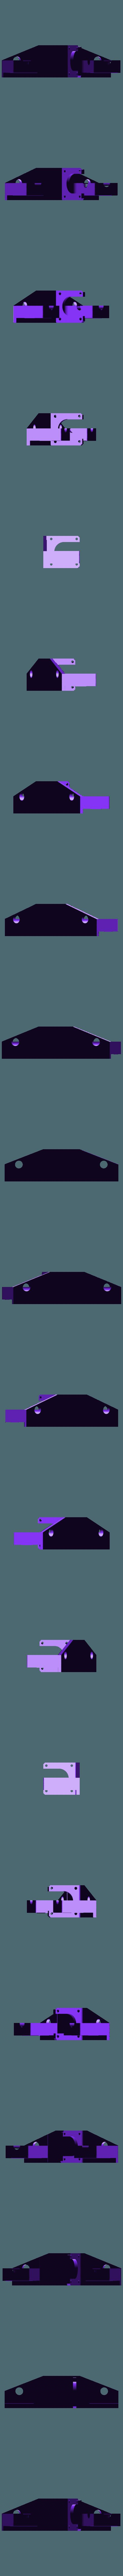 Y_car_motor_side.stl Download free STL file FDM Printer de Kleine Reus 300x300x900 • 3D printable object, Job